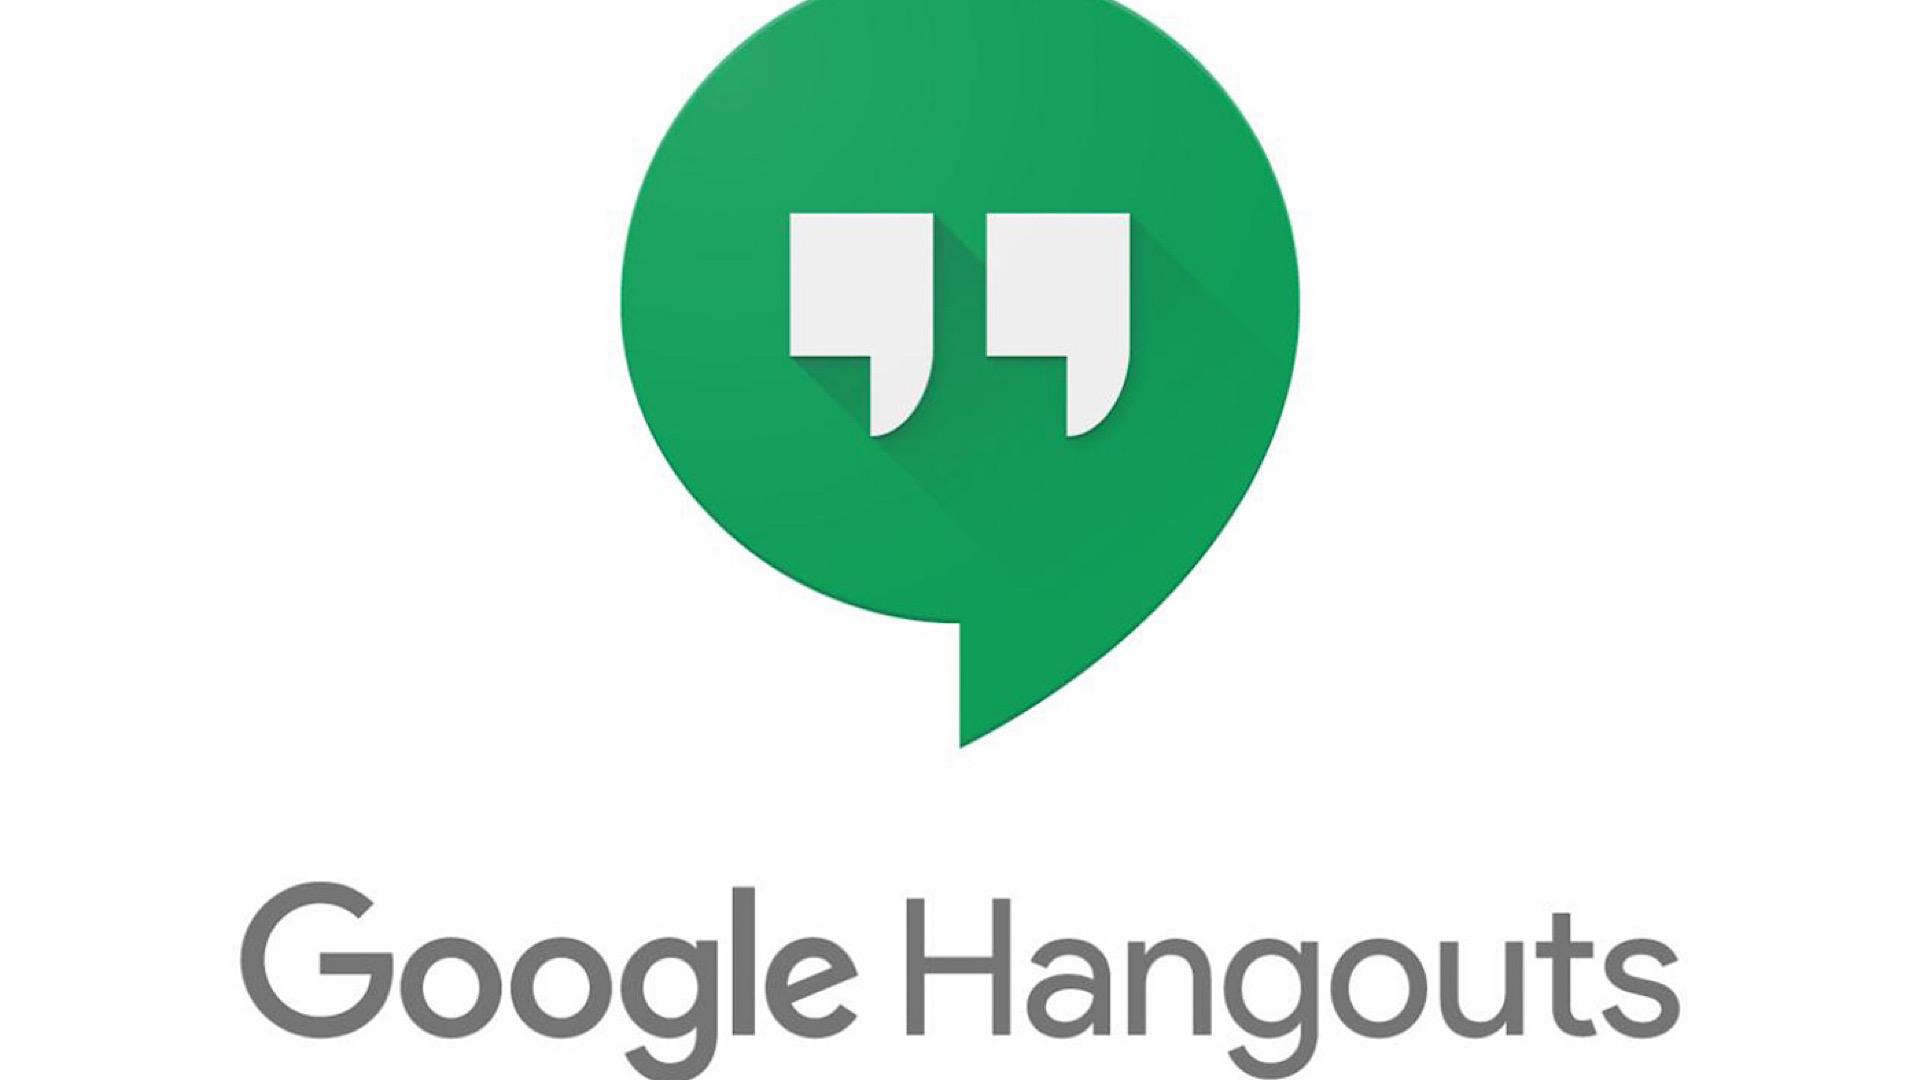 اپلیکیشن های پیام رسان گوگل